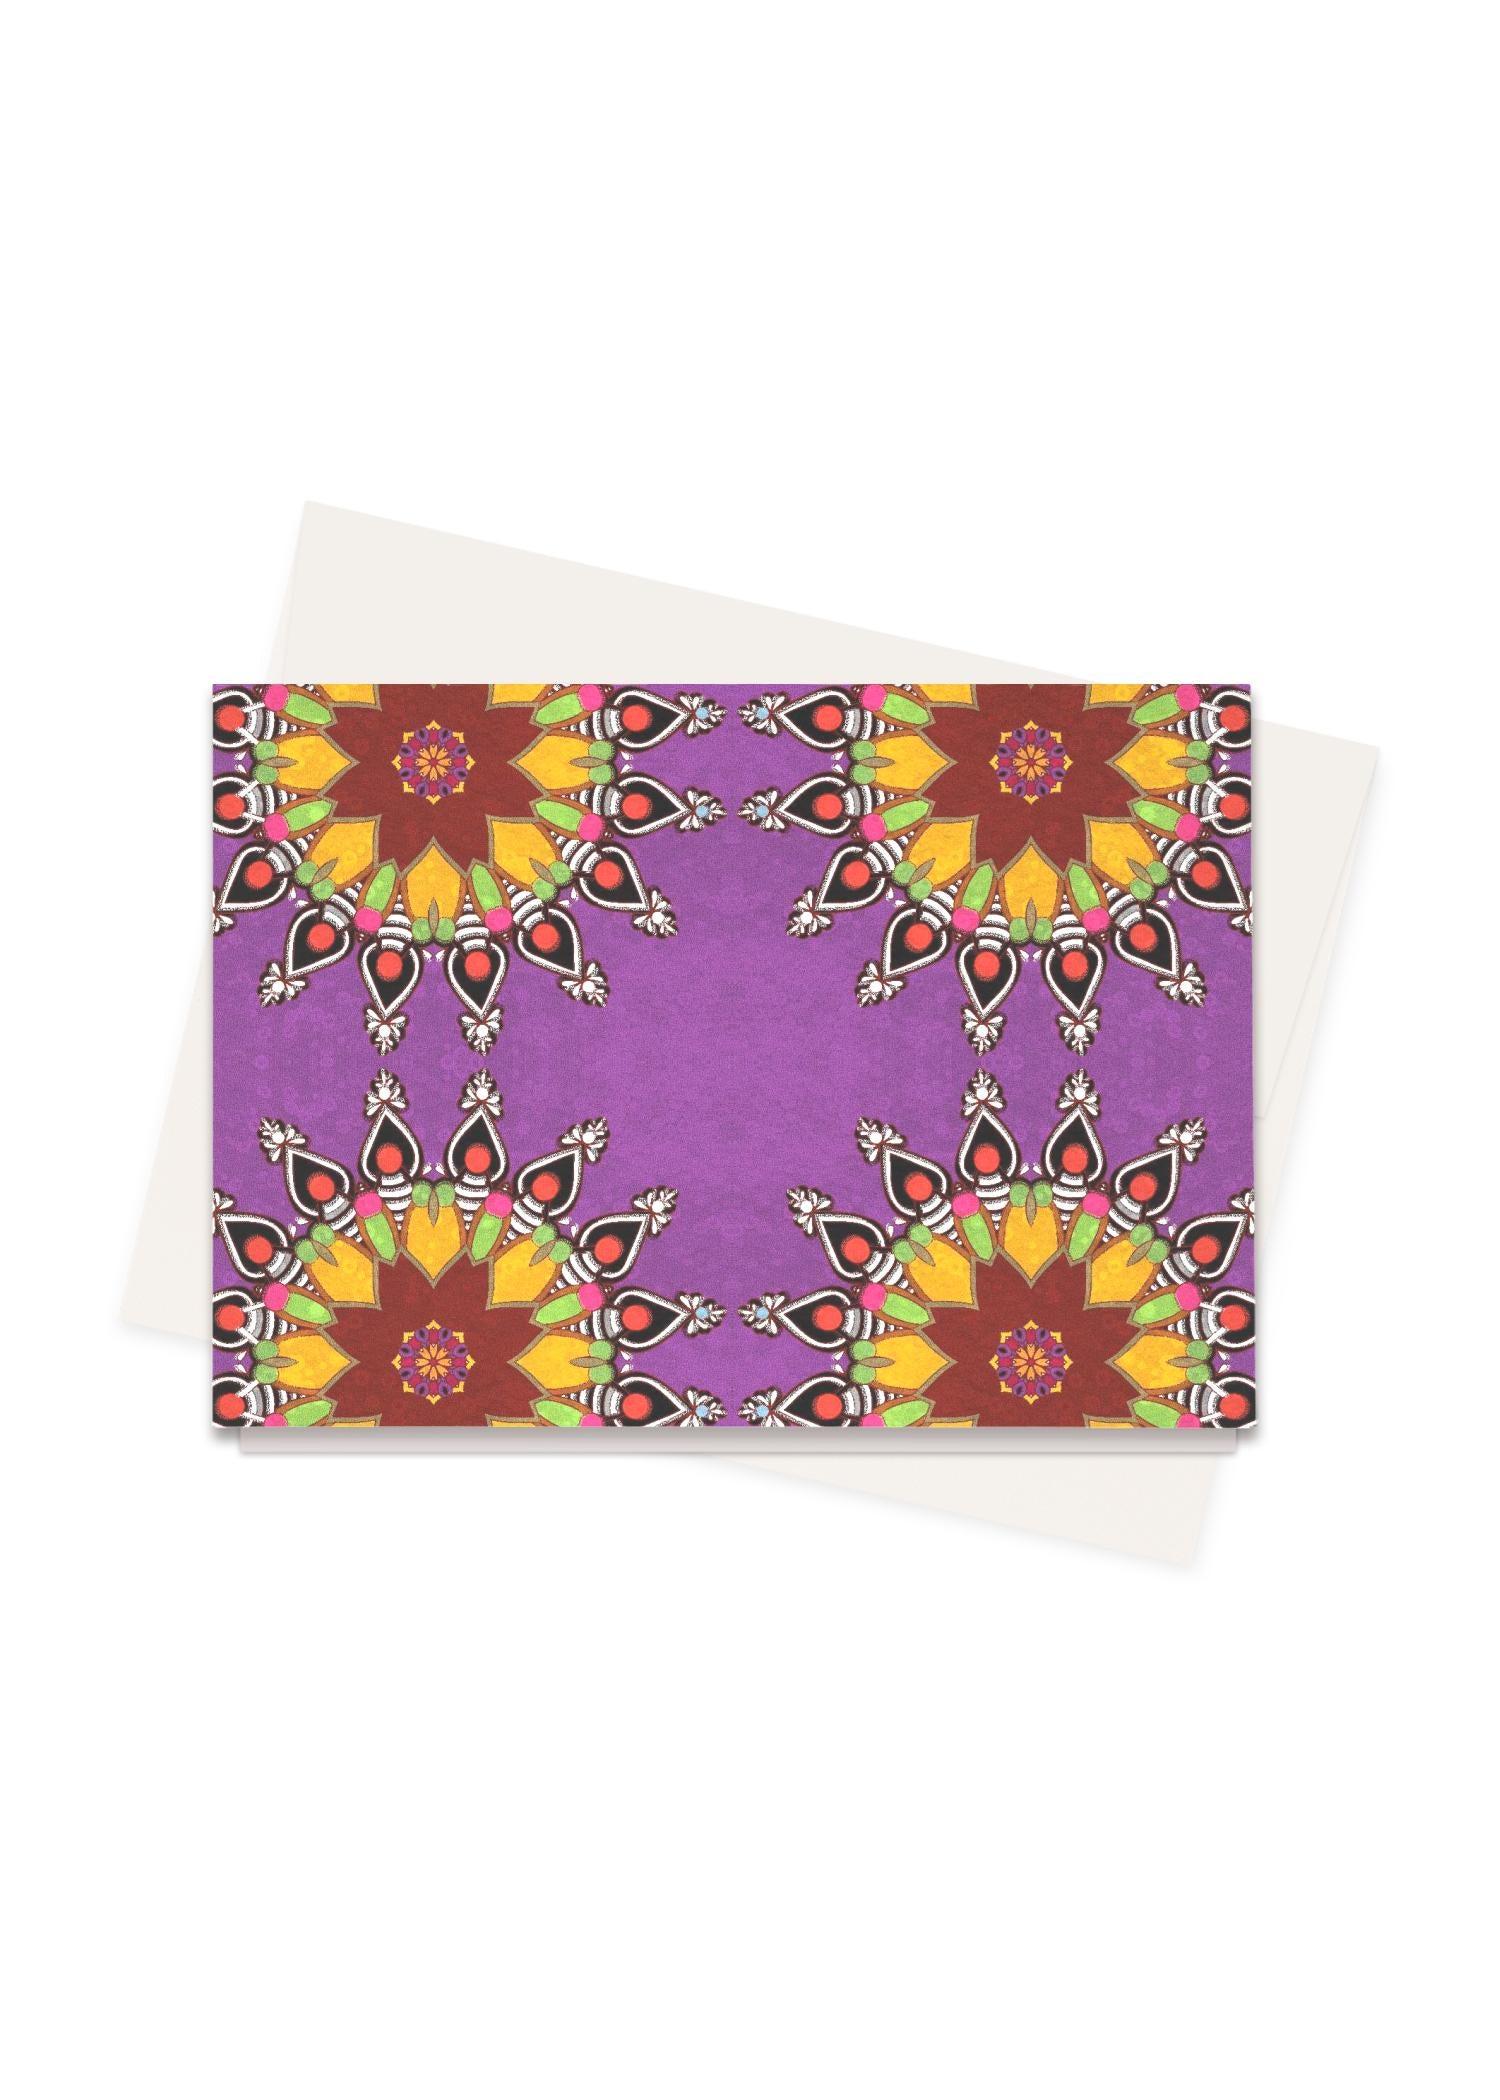 VIDA Greeting Cards Set - The Mandala Pillow by VIDA Original Artist  - Size: Set of 16